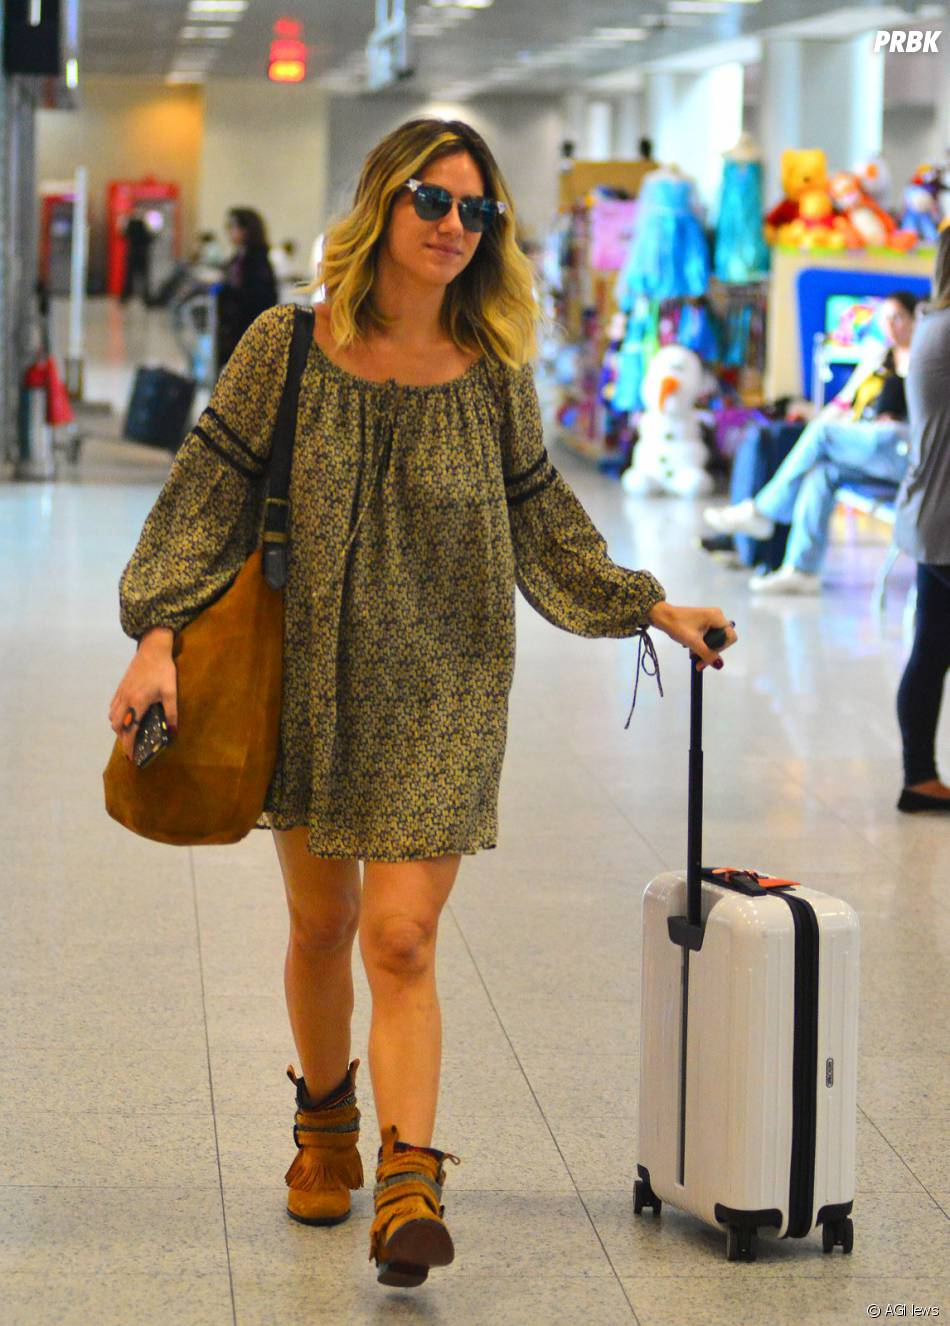 ff46b6872 Giovanna Ewbank usa look hippie chique em aeroporto - Purebreak